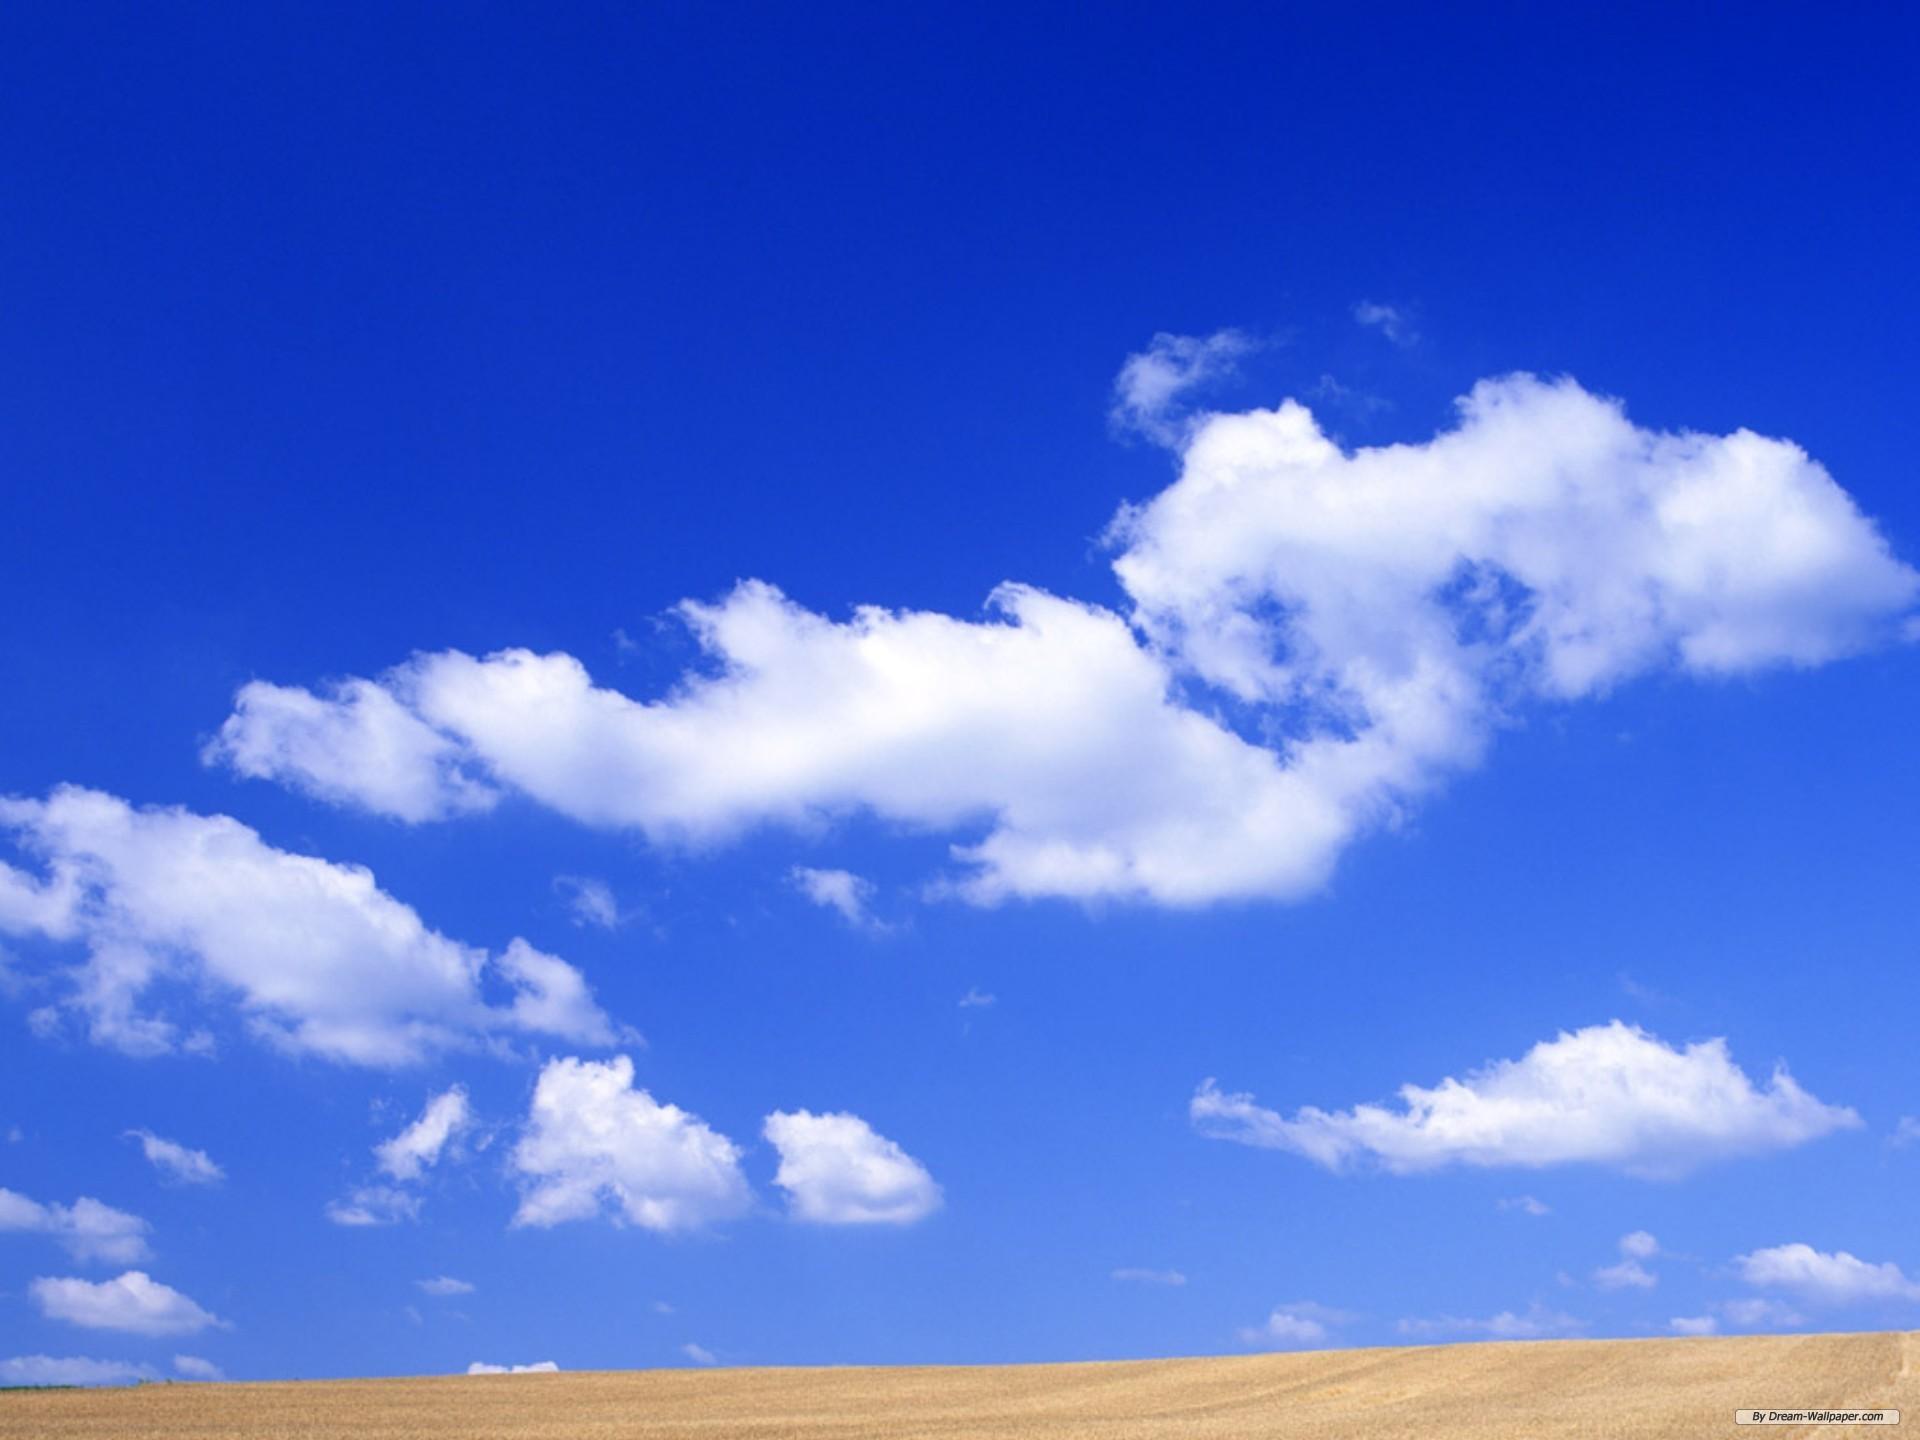 wallpaper – Blue Sky And White Cloud 2 wallpaper – wallpaper .